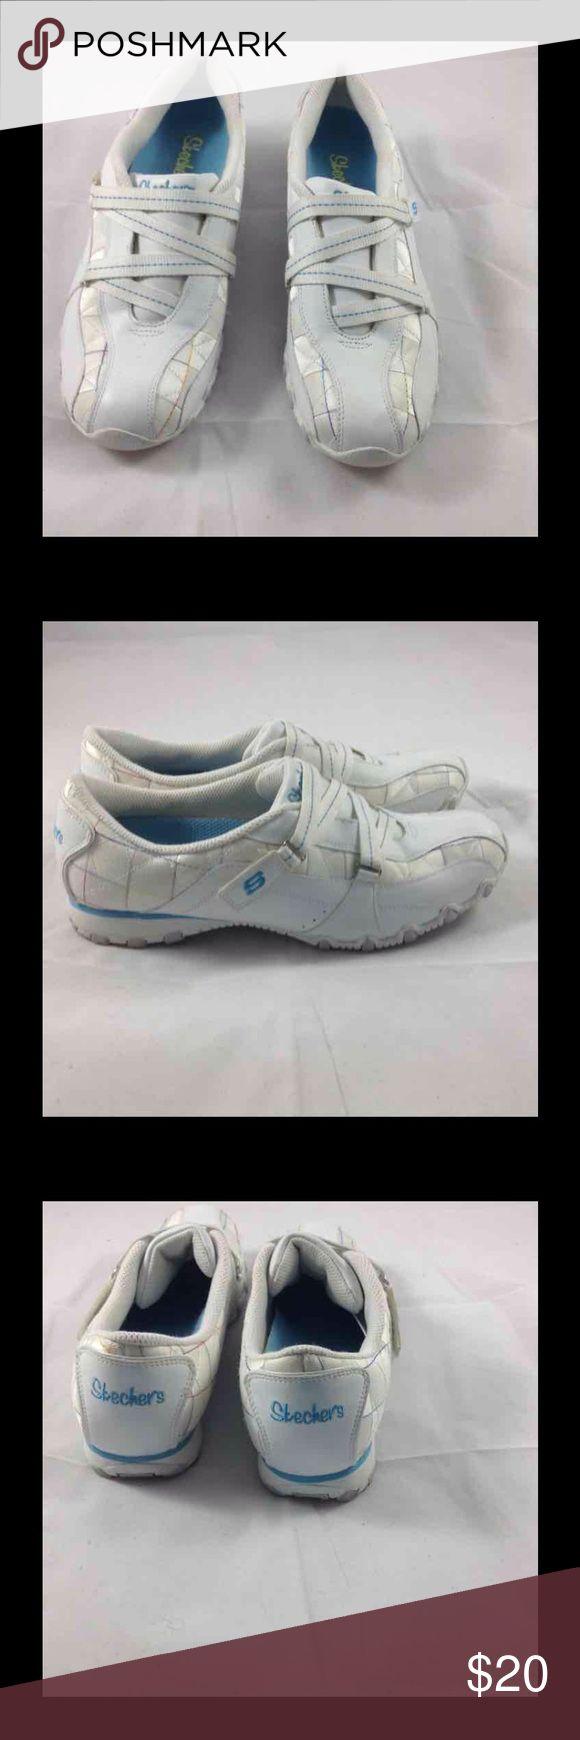 Sketchers Skechers shoes size 9.5 excellent condition Skechers Shoes Athletic Shoes